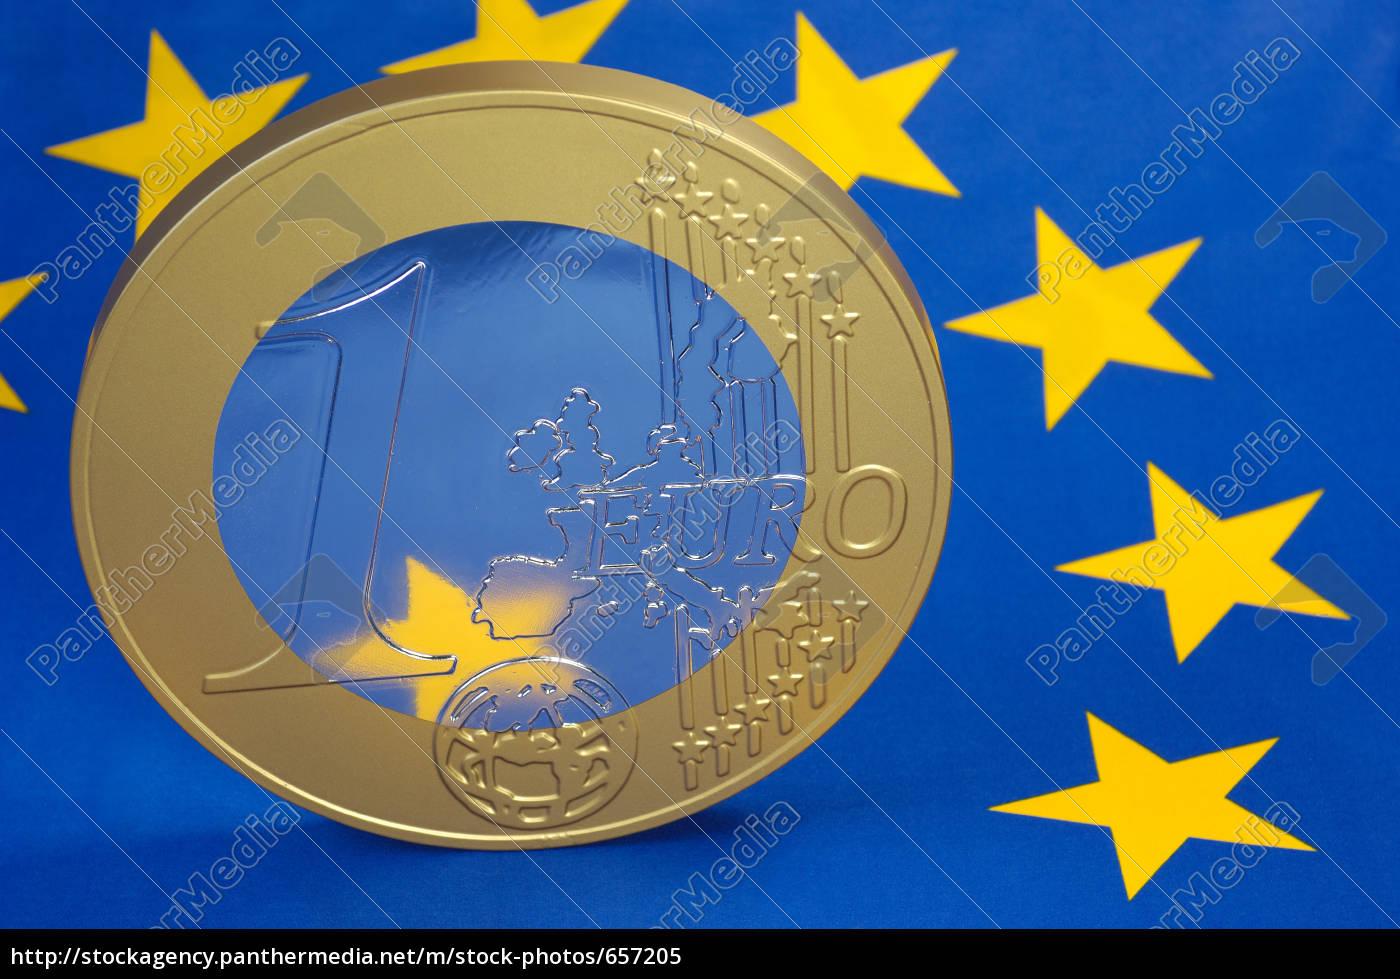 euro, coin, on, the, european, flag - 657205